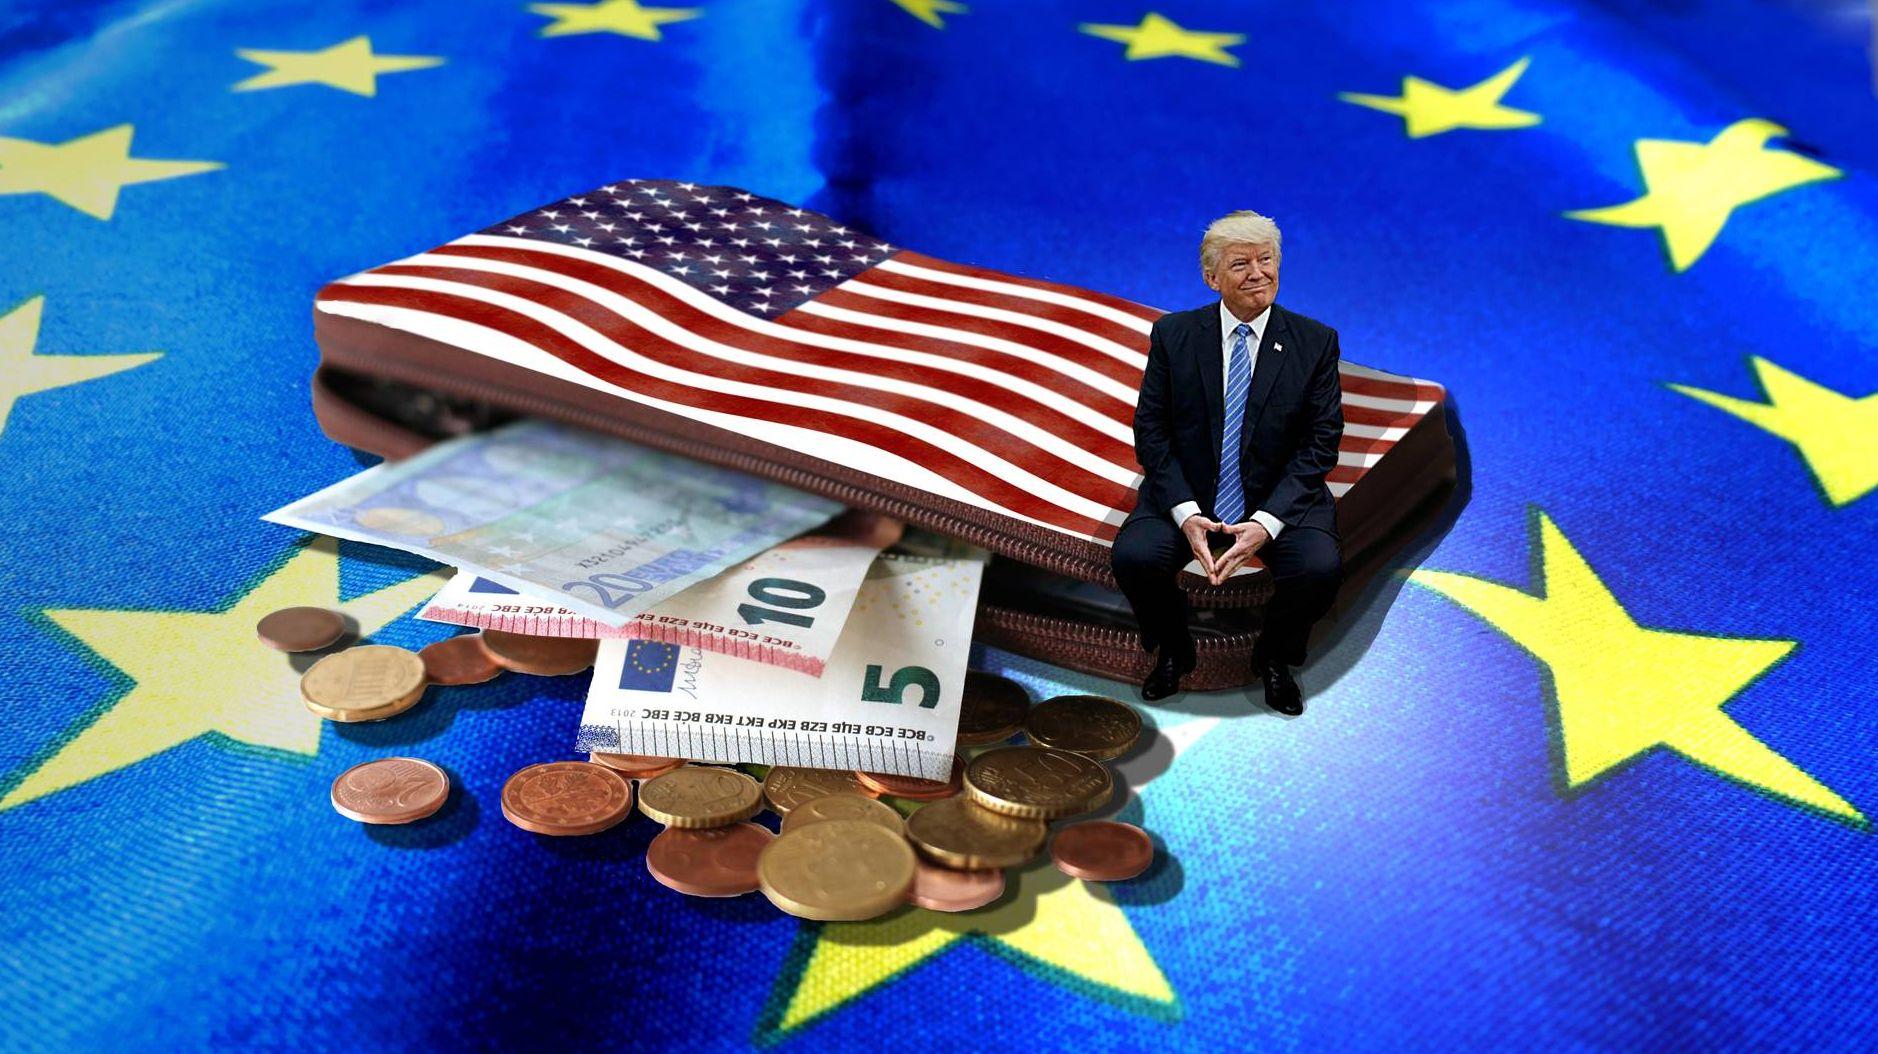 Трамп и экономика